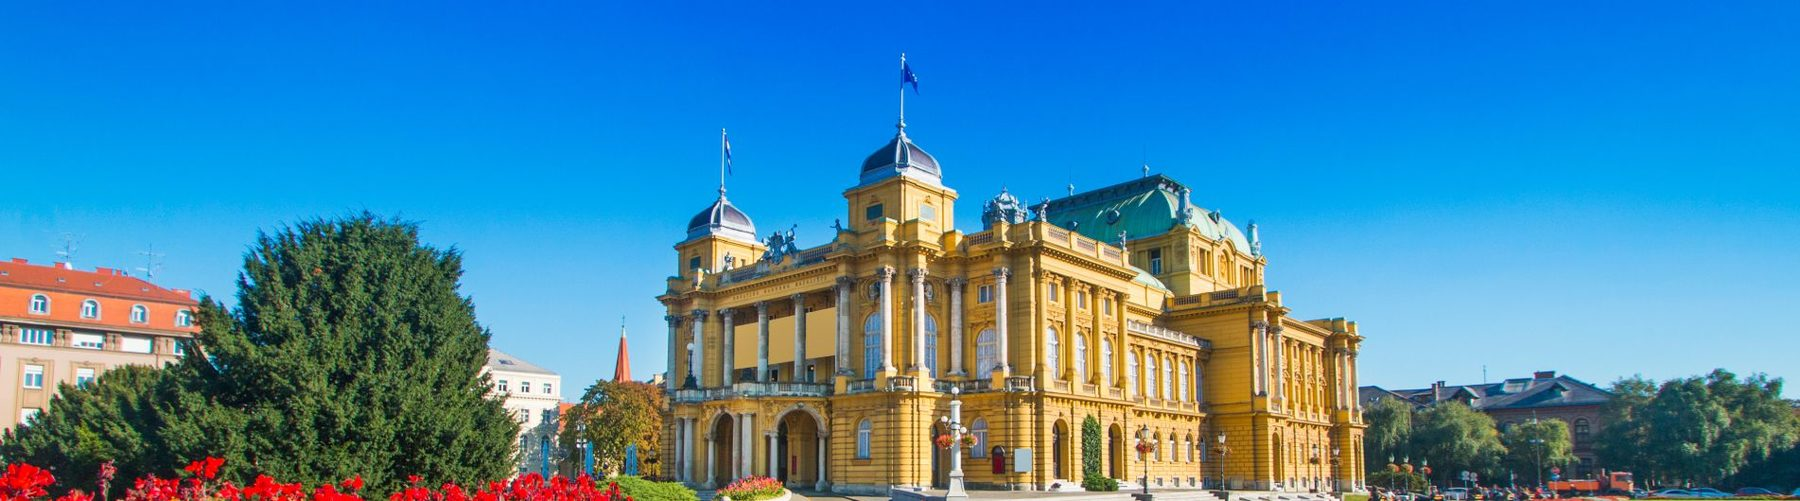 Capital City, Zagreb (Croatia)